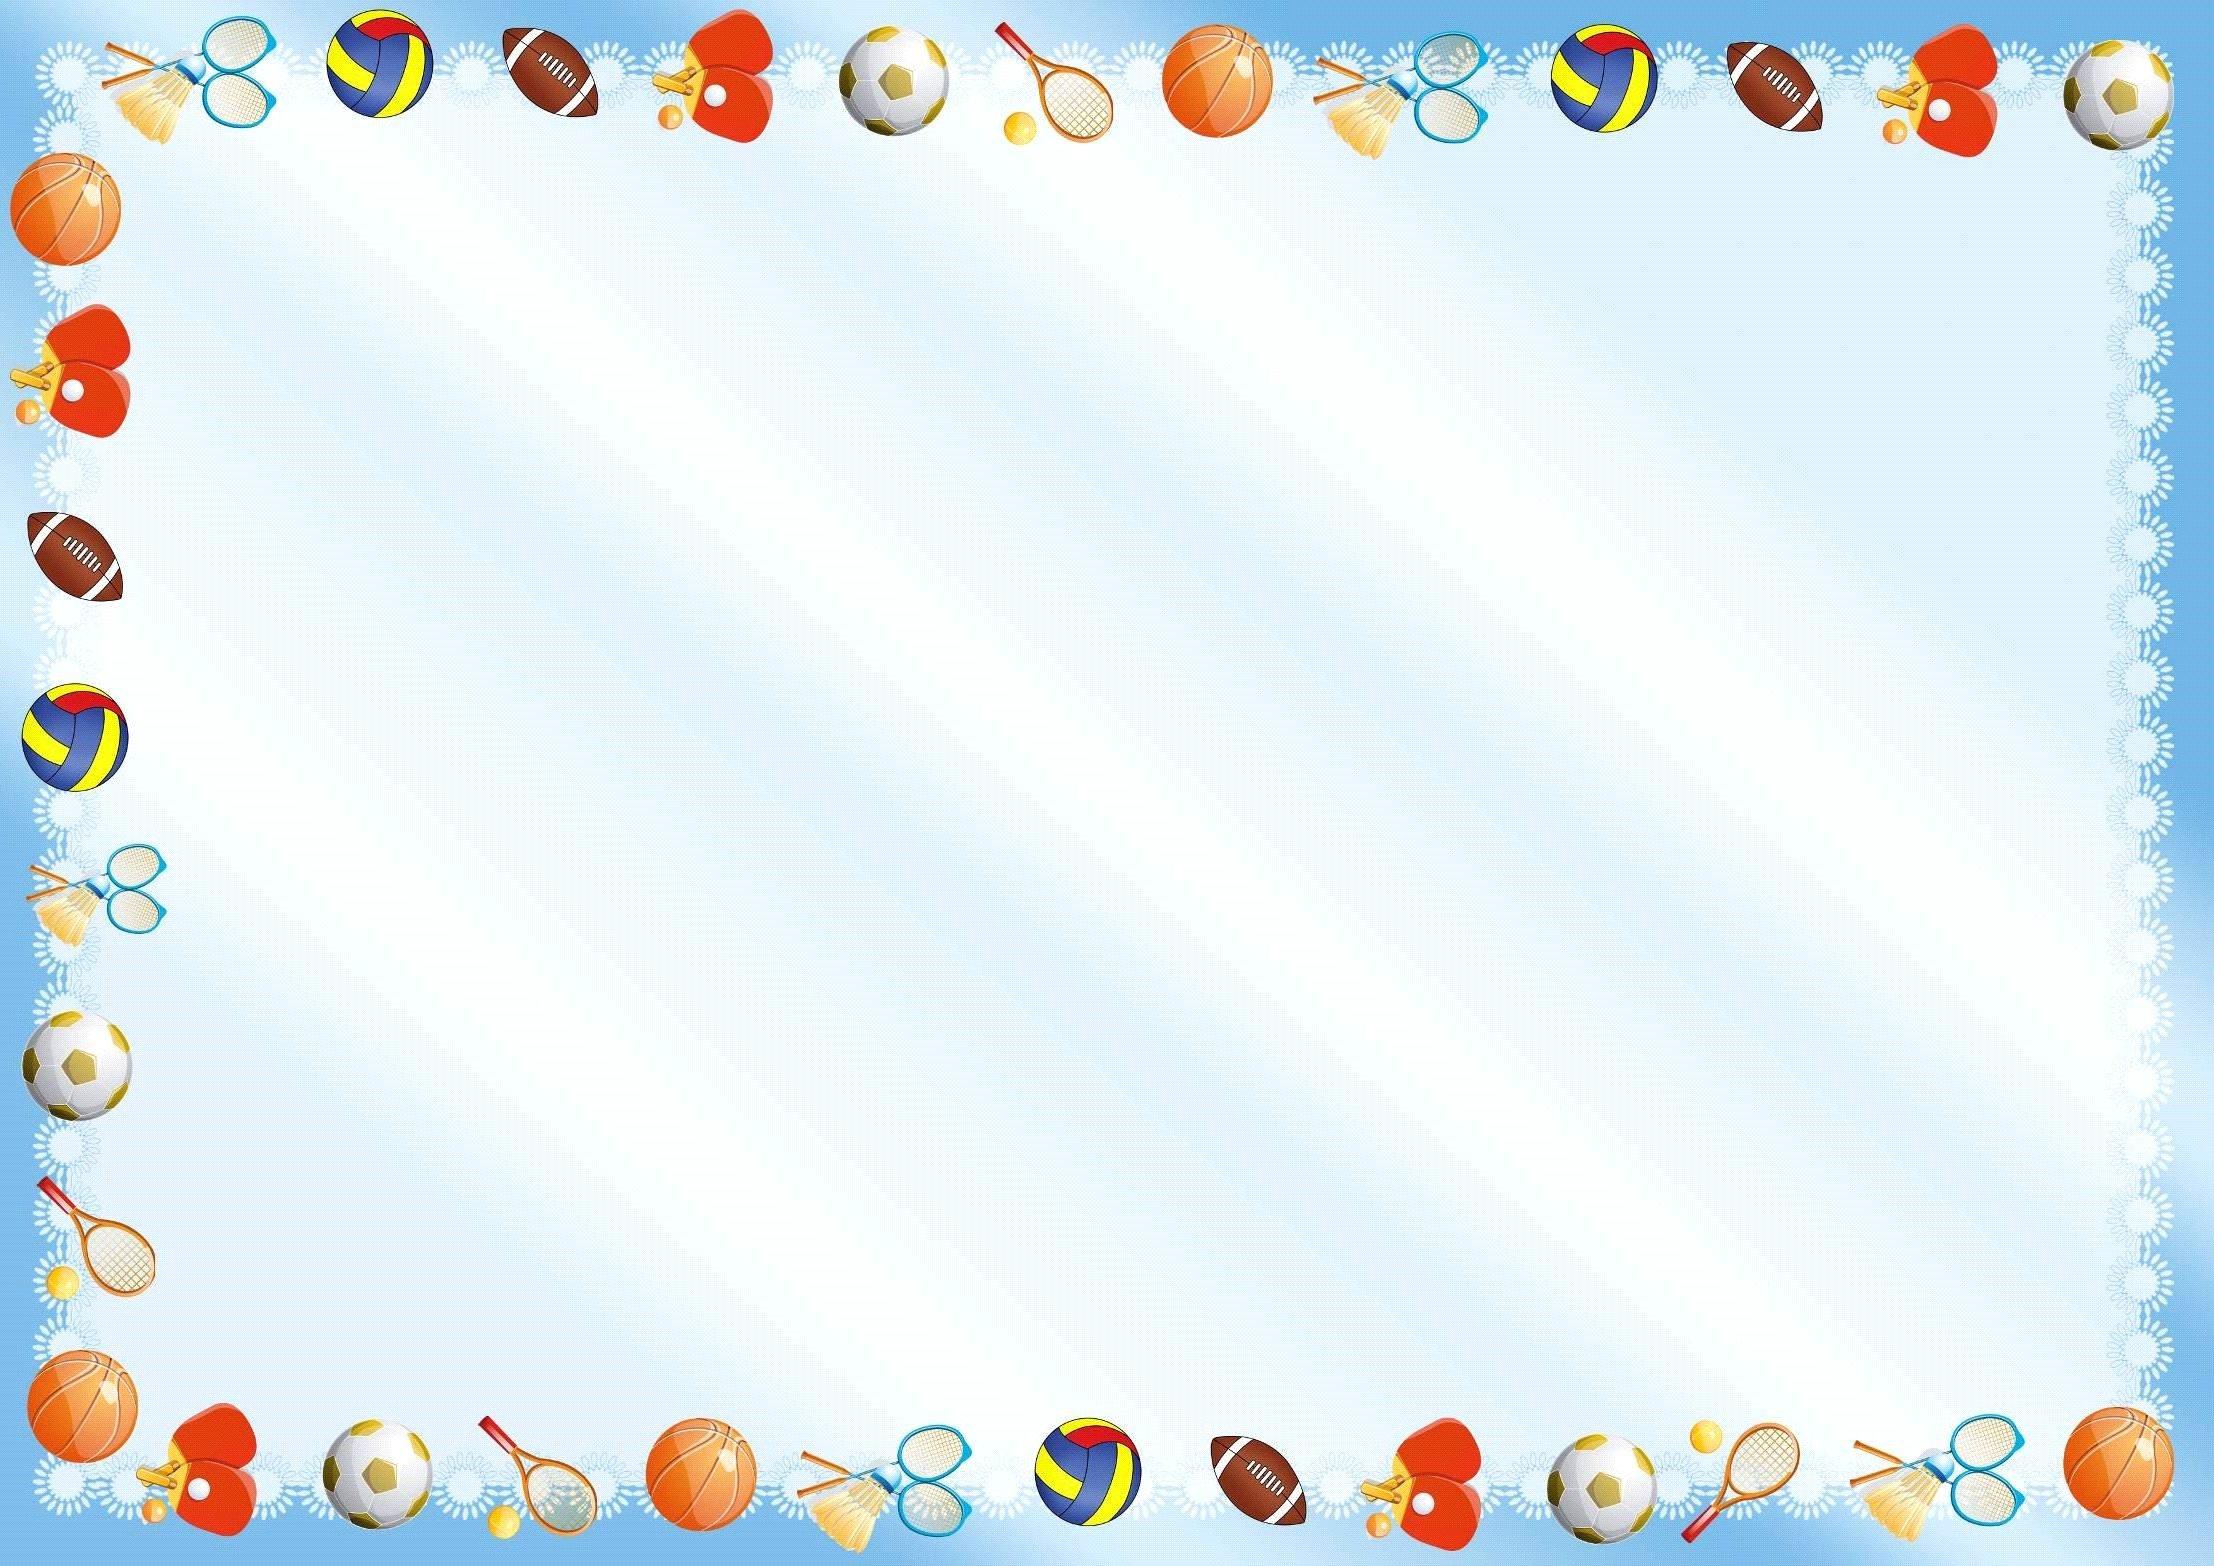 Картинка спортивная фон для презентации